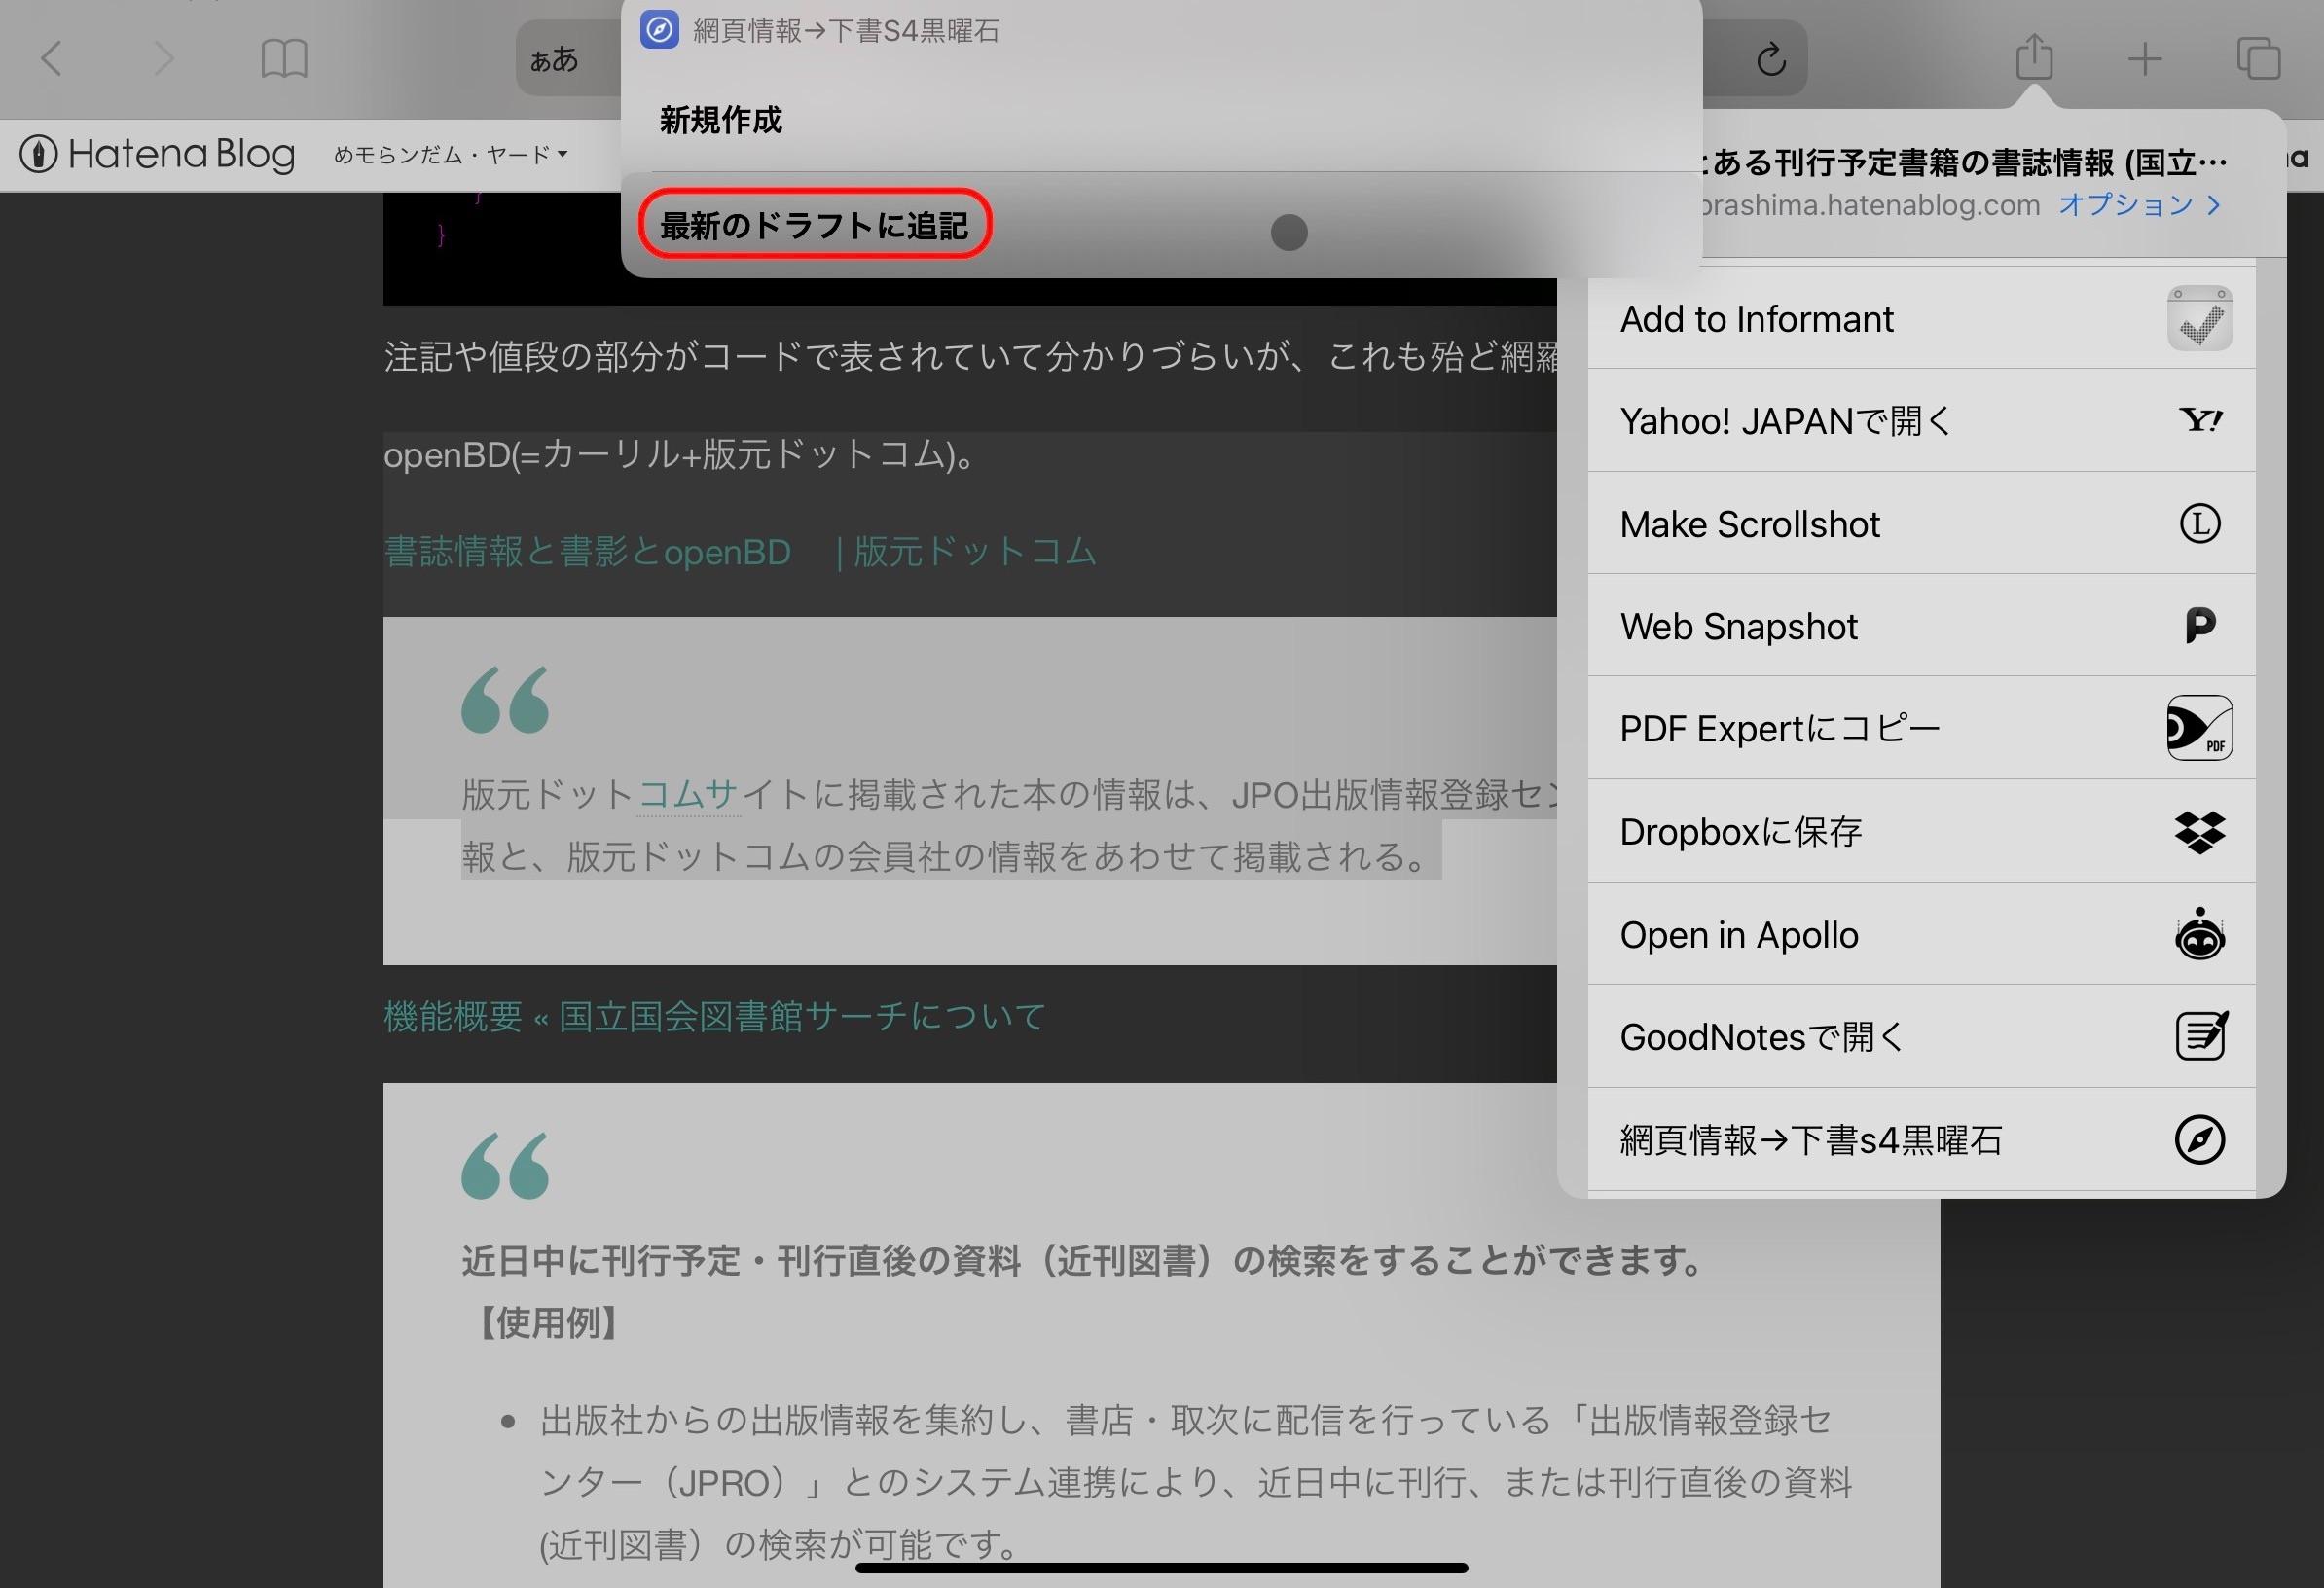 f:id:sorashima:20210702192344j:plain:w990